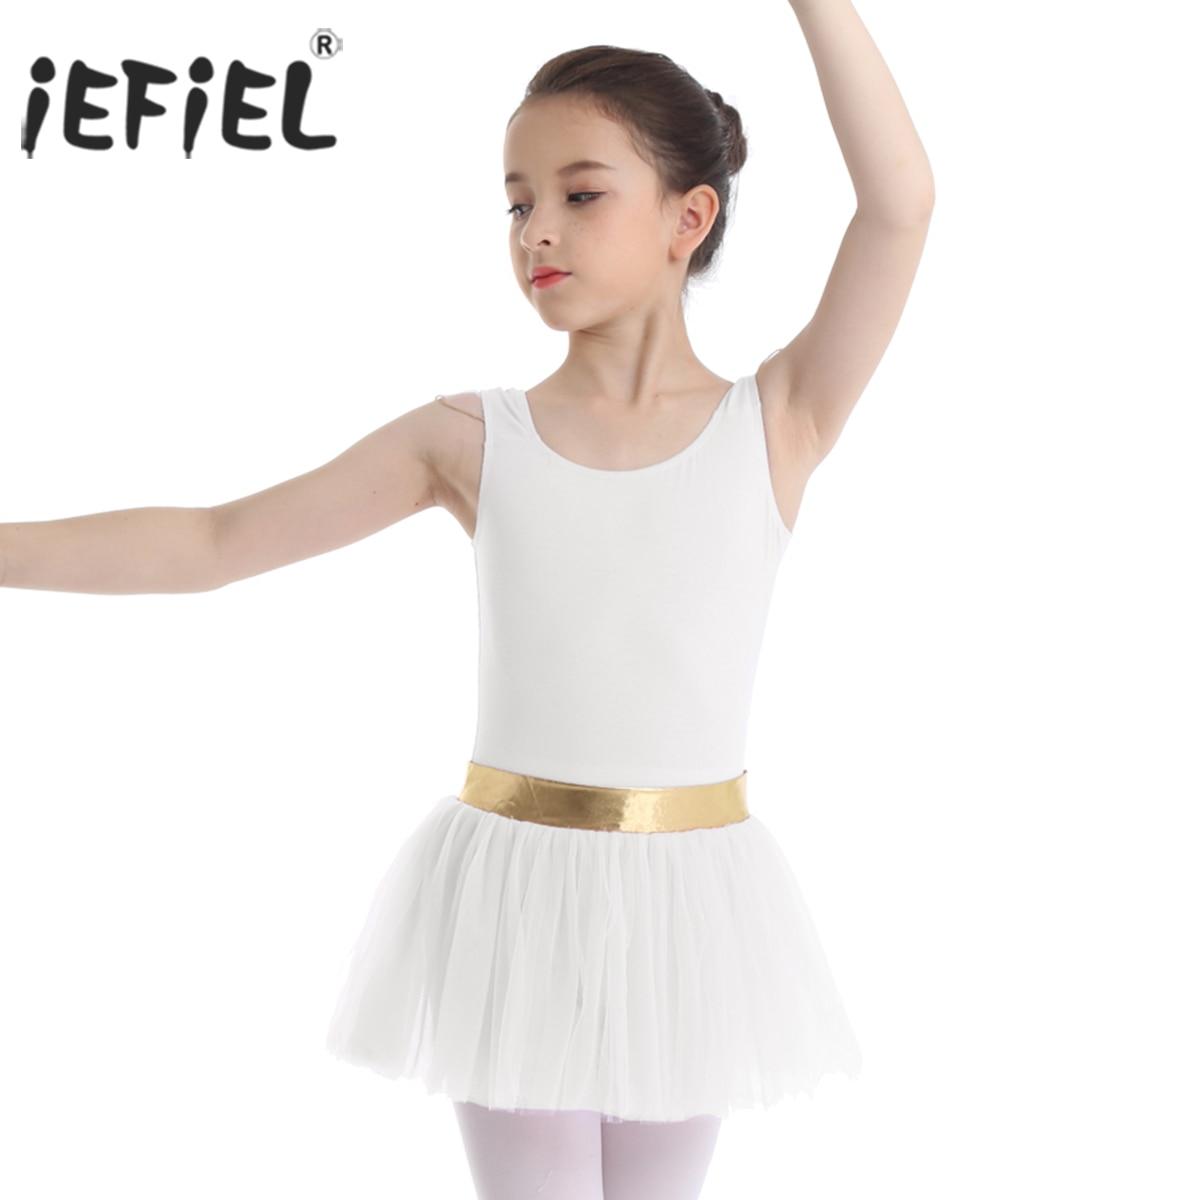 Kids Girls Lace Fly Sleeve Leotard for Dance Gymnastics Ballet Unitards Costume